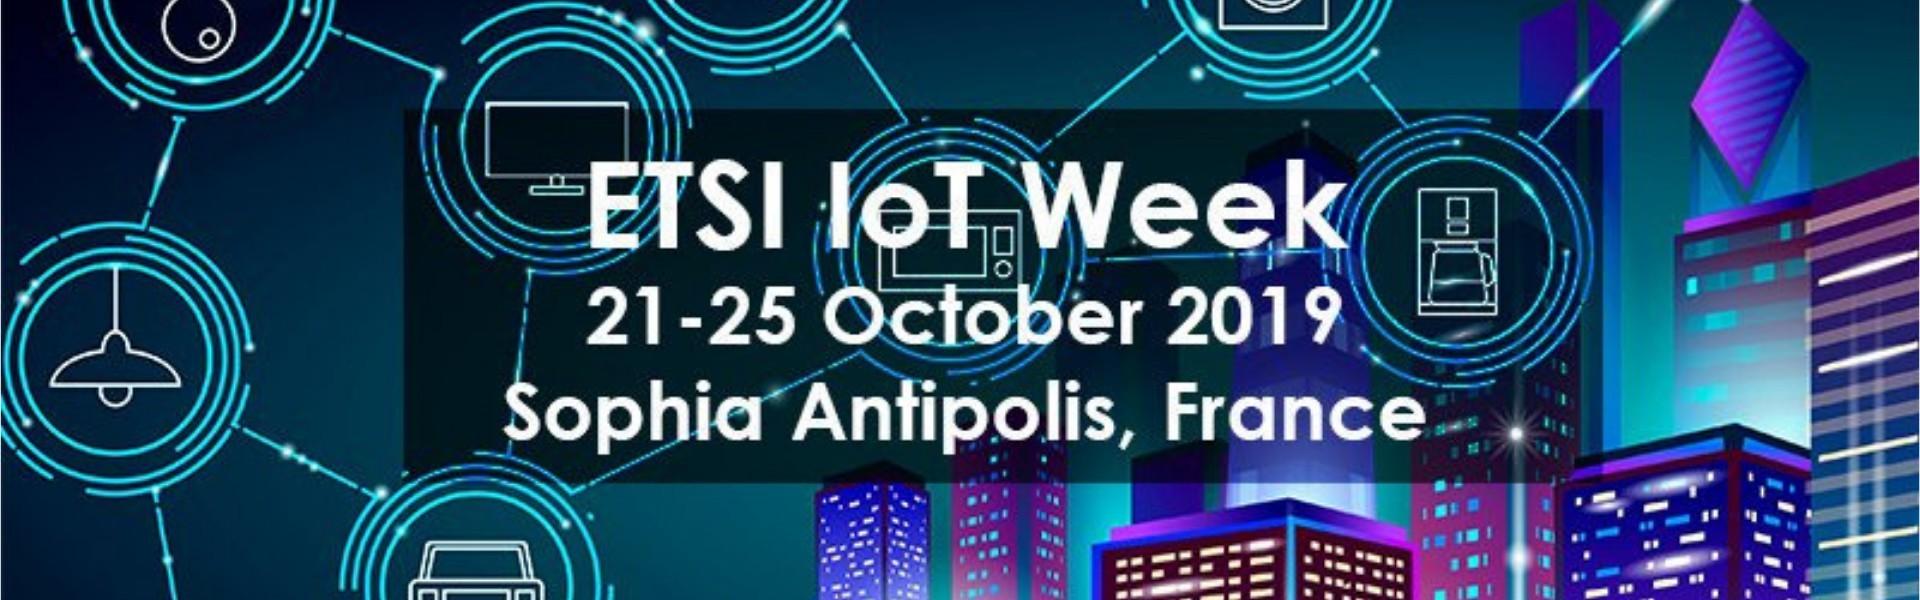 etsi-iot-week-2019